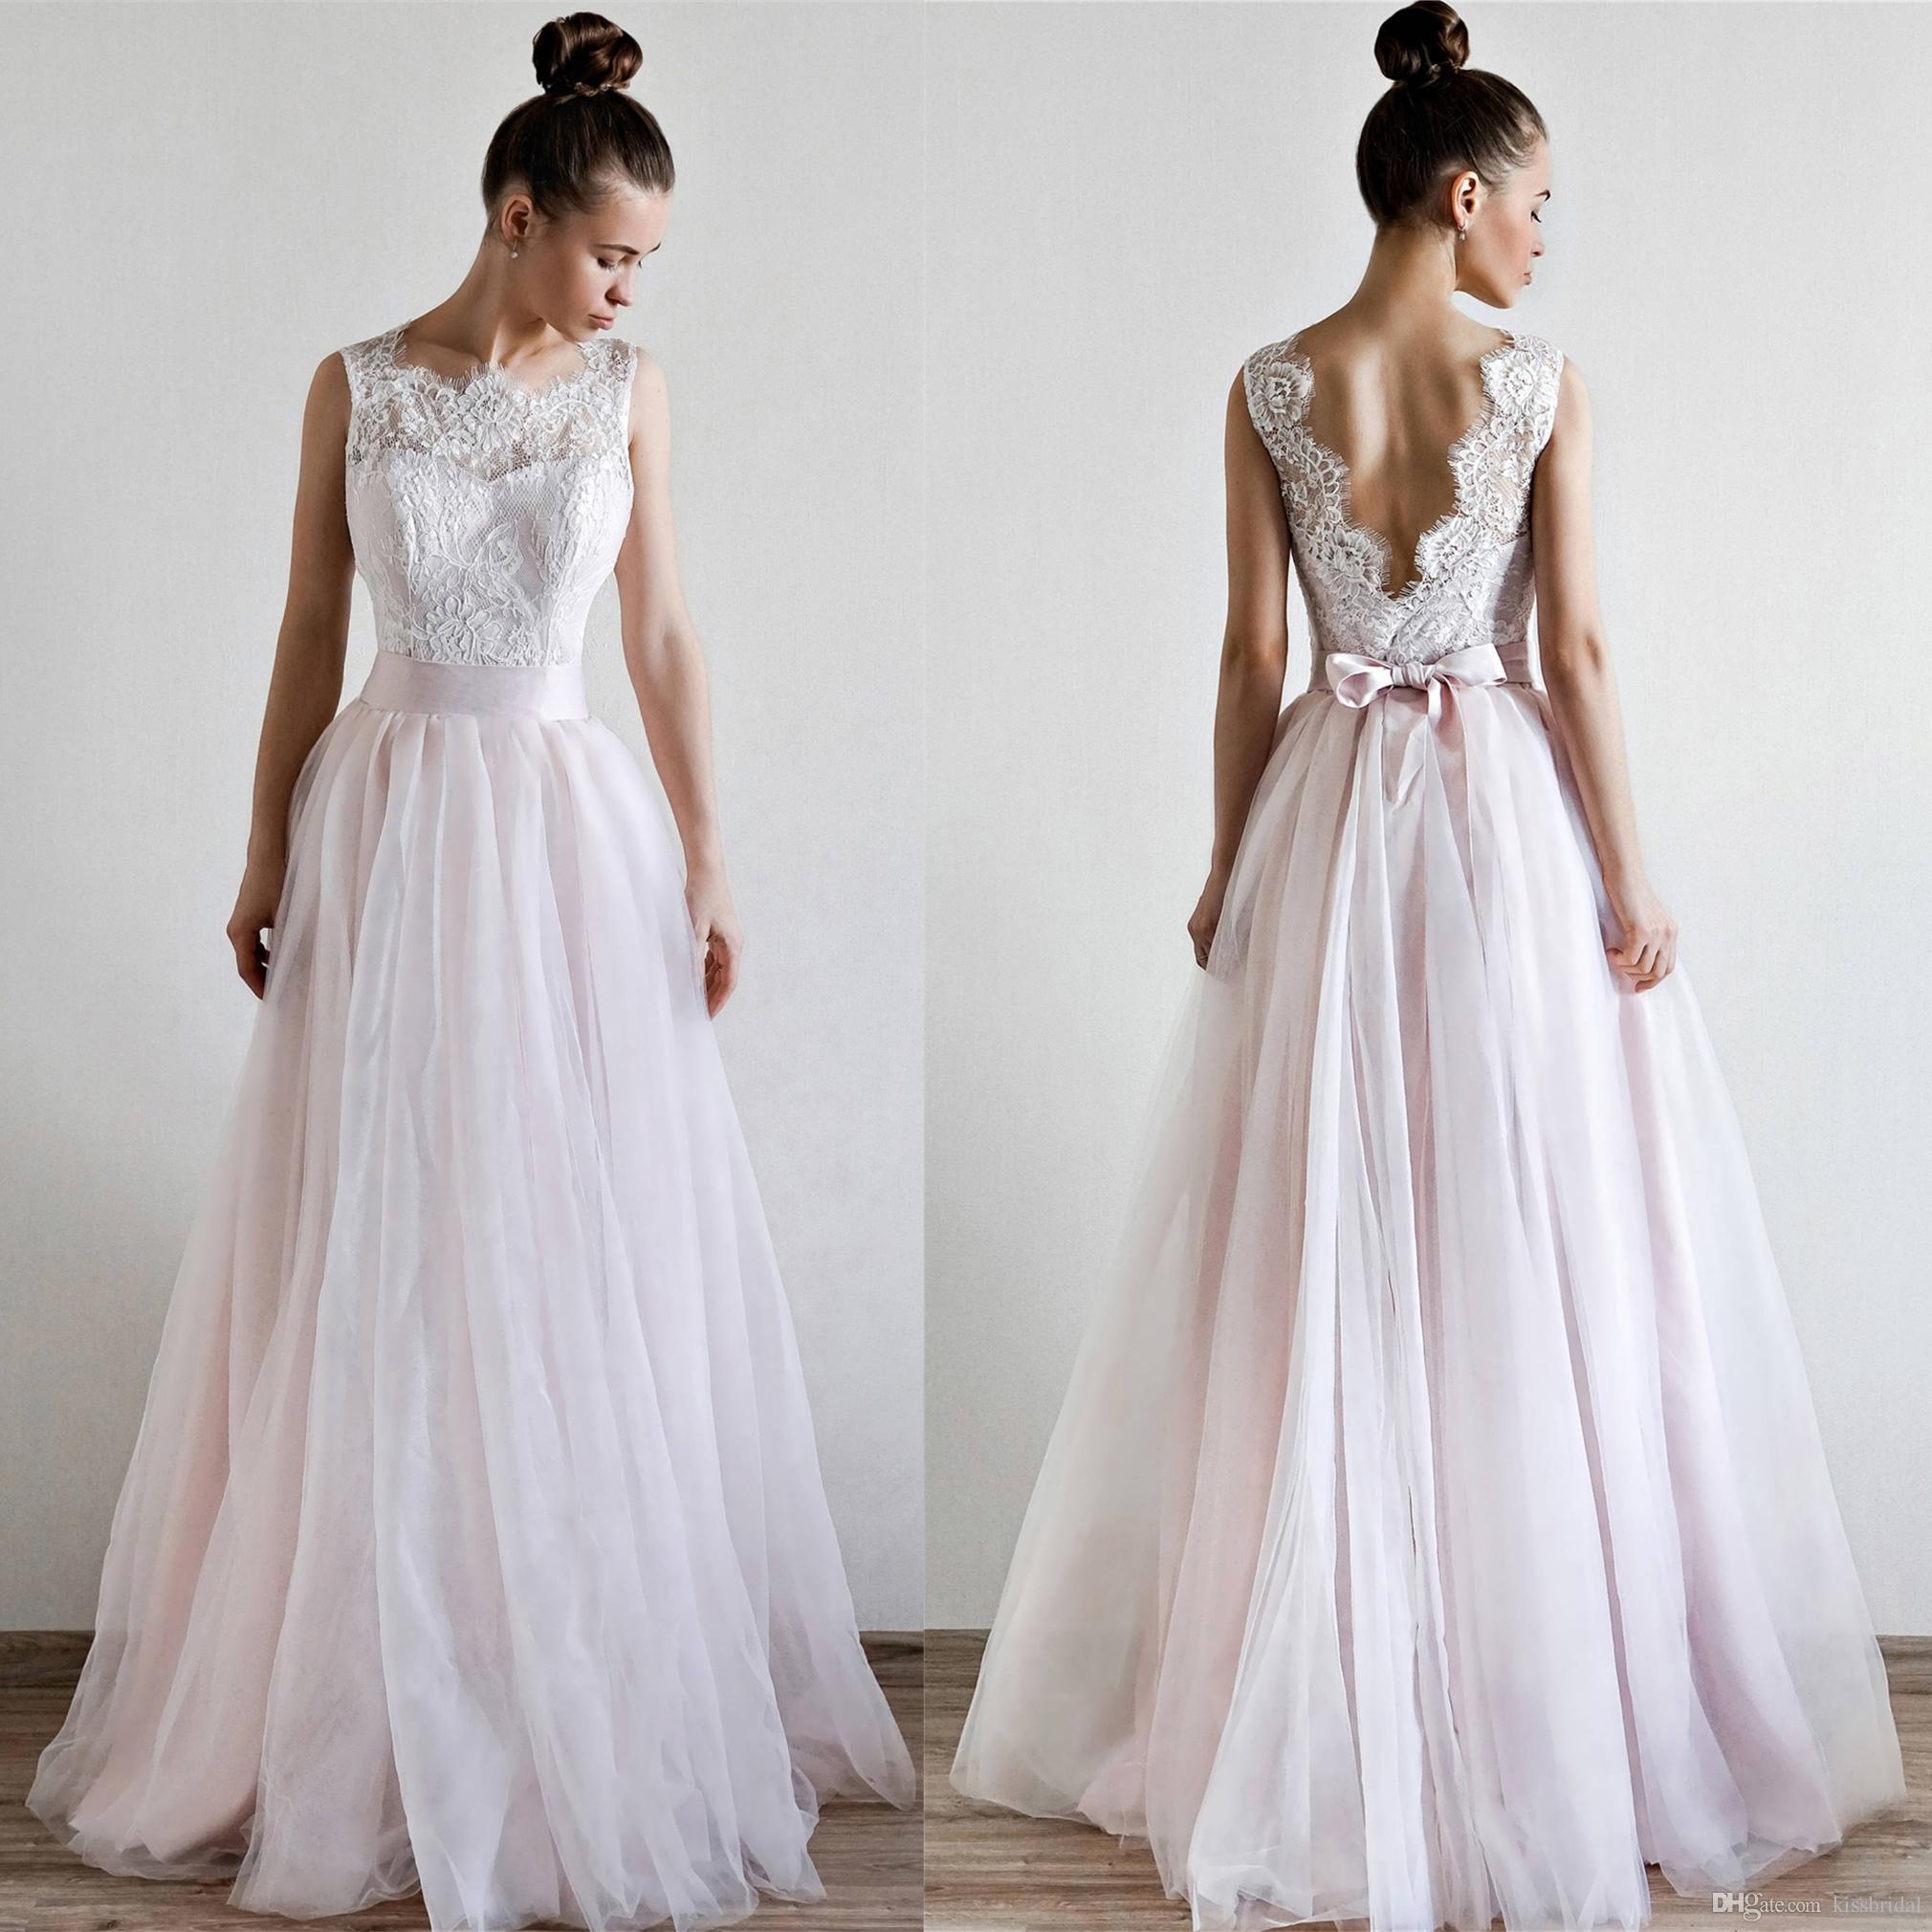 c1a65c1d59 Discount Lace Tulle Wedding Dresses 2019 Elegant A Line Backless Sash Bridal  Gowns Formal Dress For Bride Special Occasion Vestidos De Novia Ivory  Wedding ...